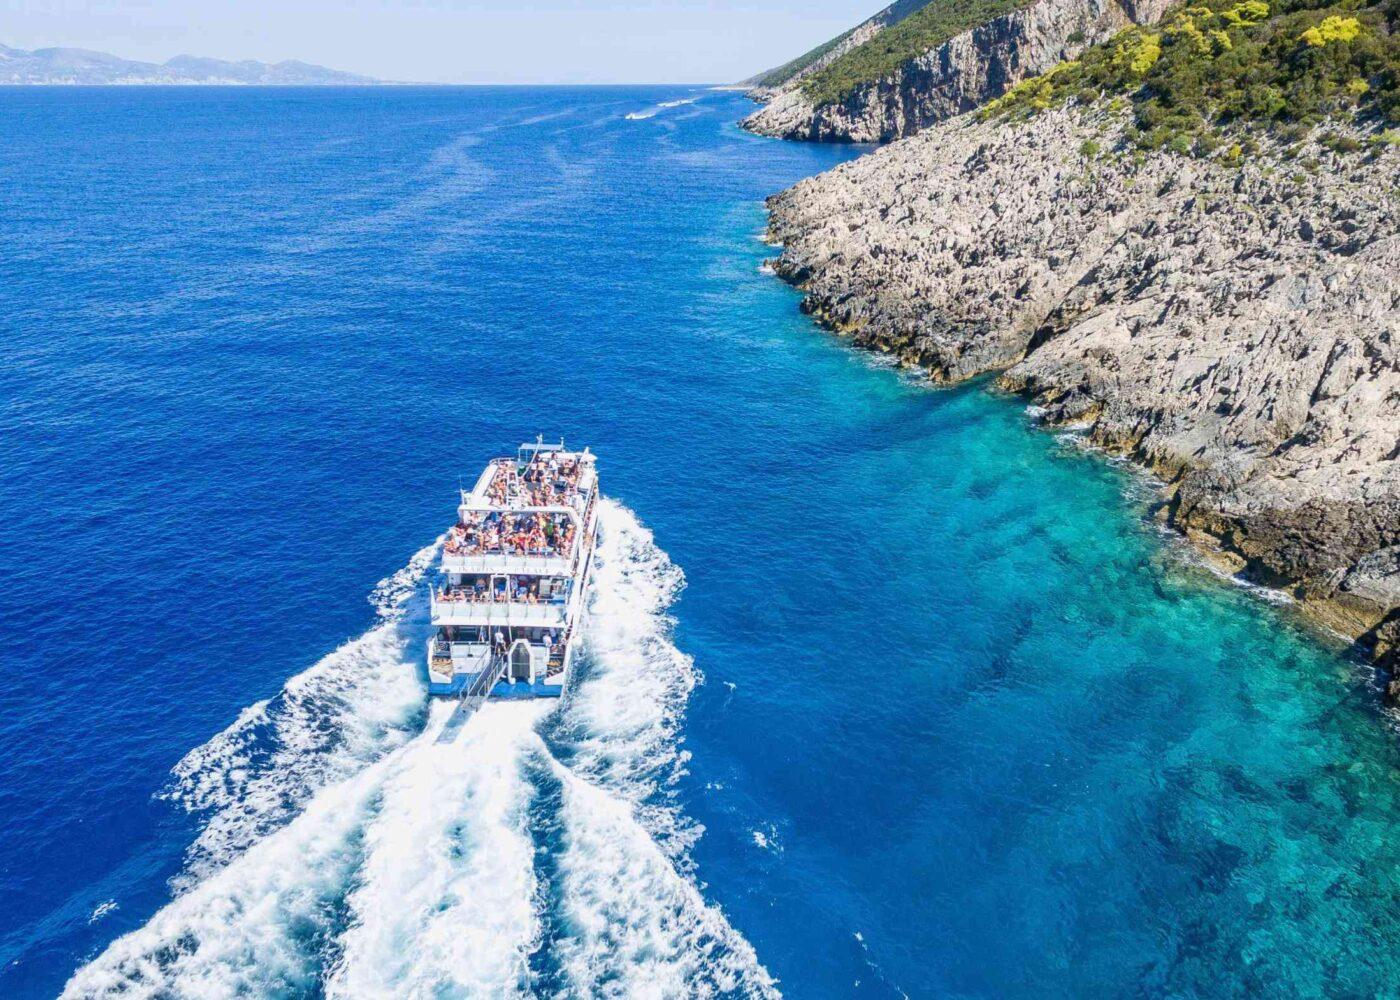 vvip zante boat party 2022 (2)